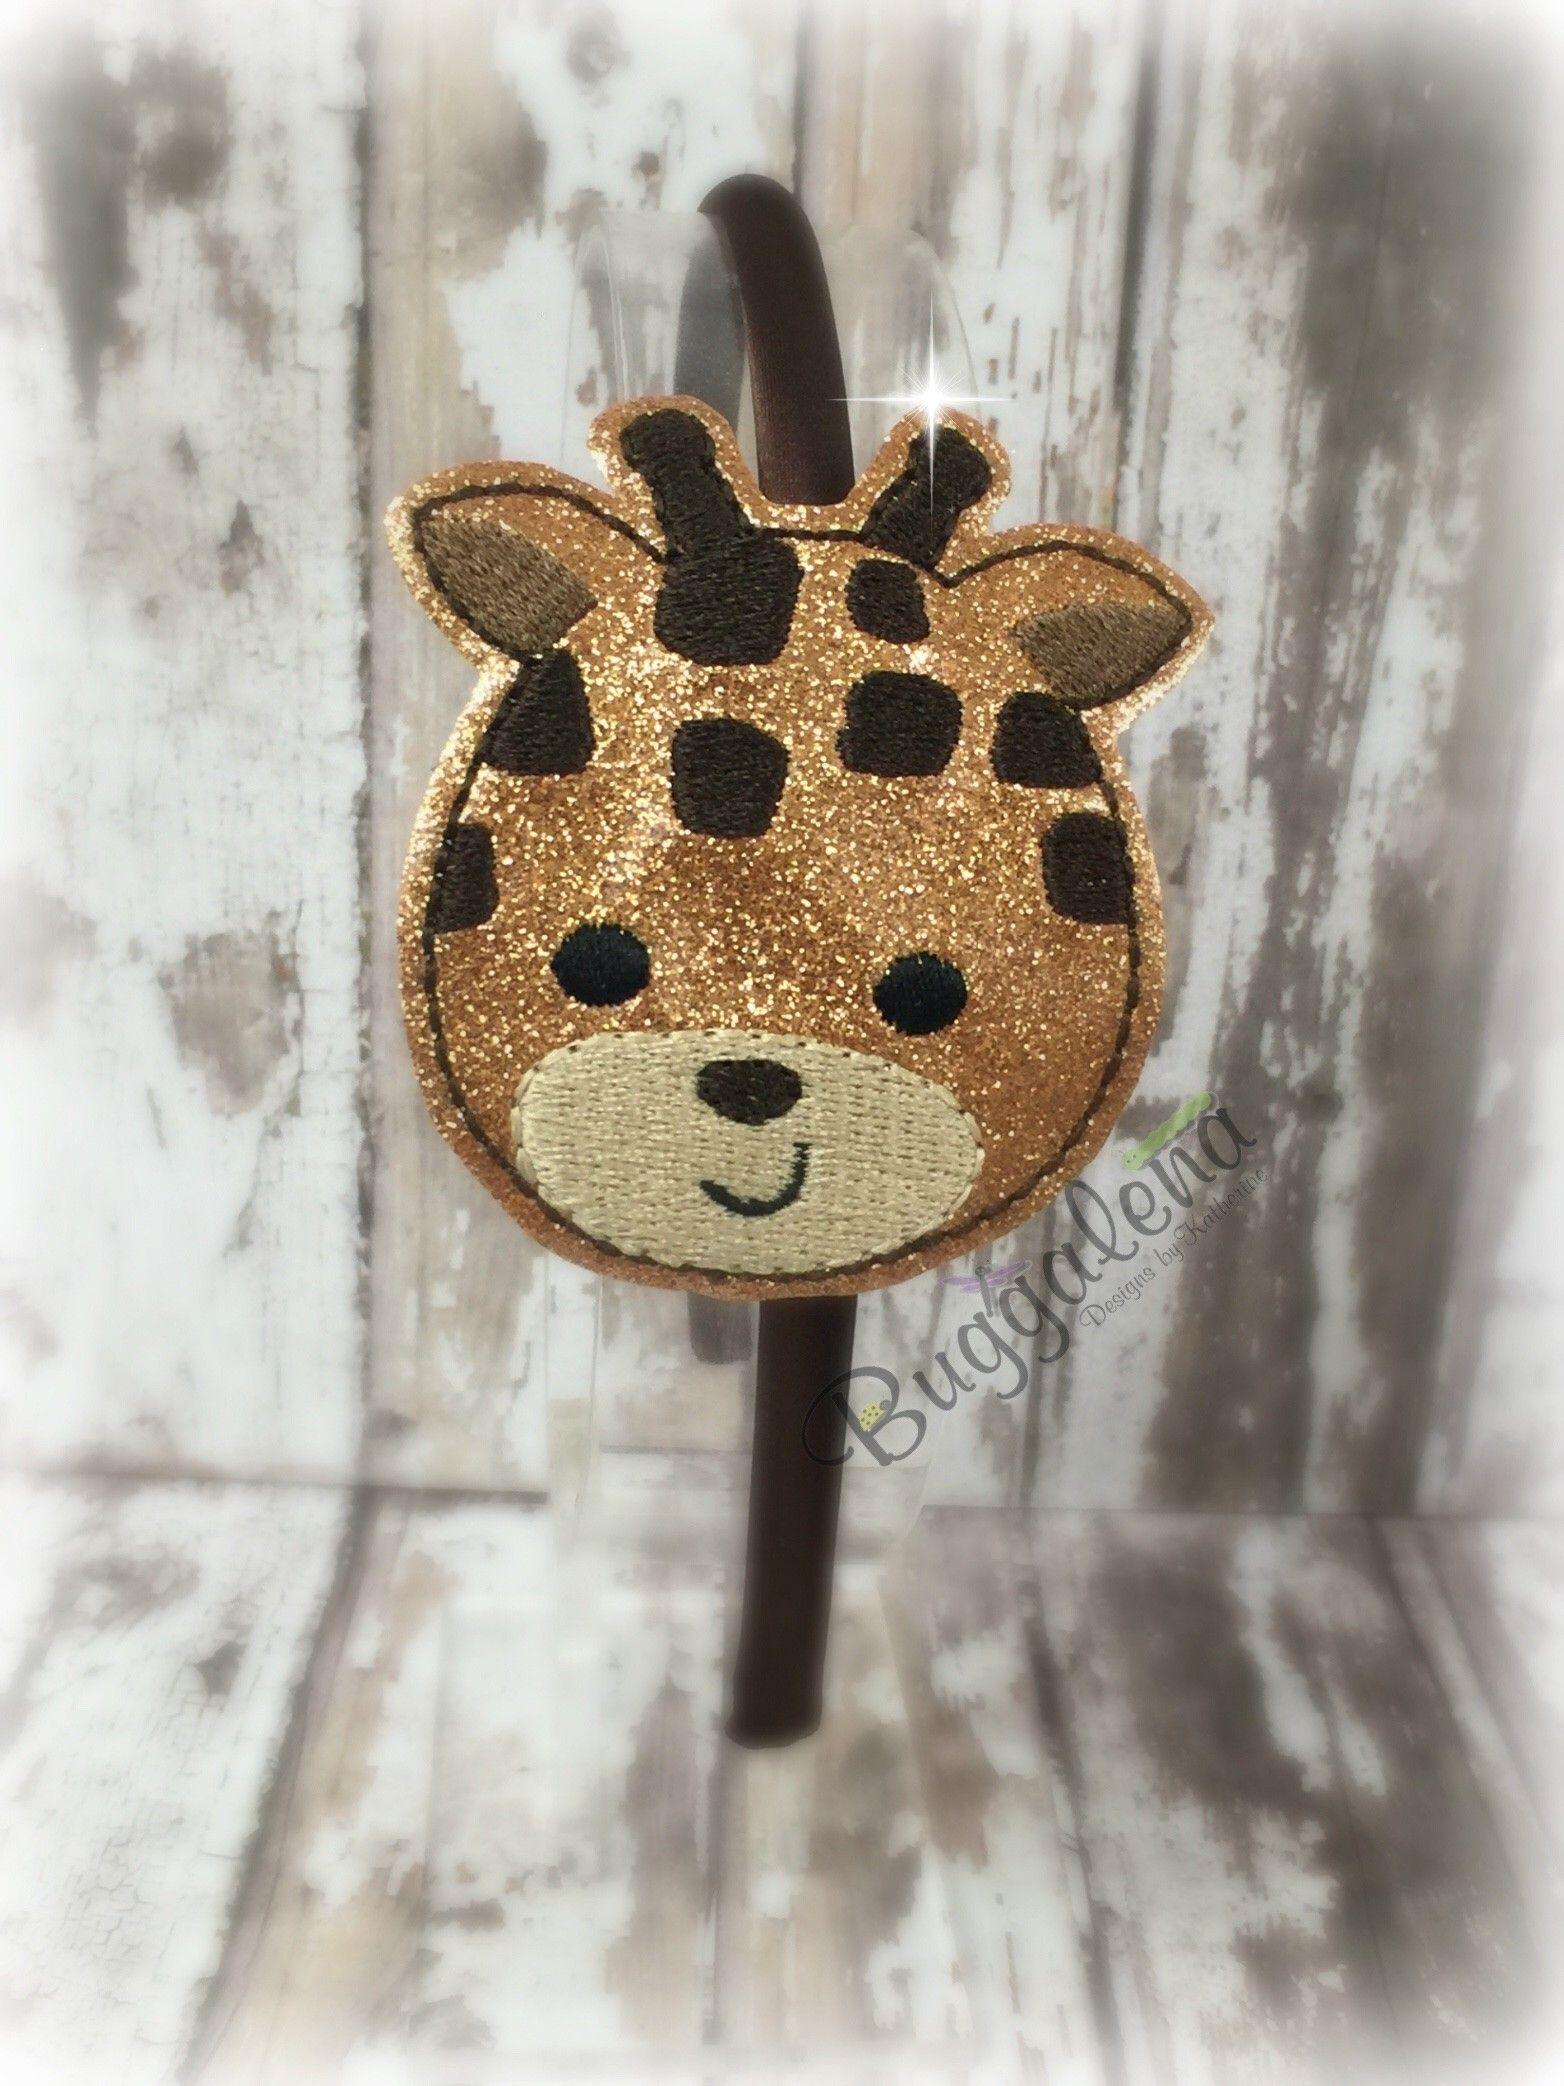 Giraffe BuggaBand Headband Slider Embroidery Design by Buggalena